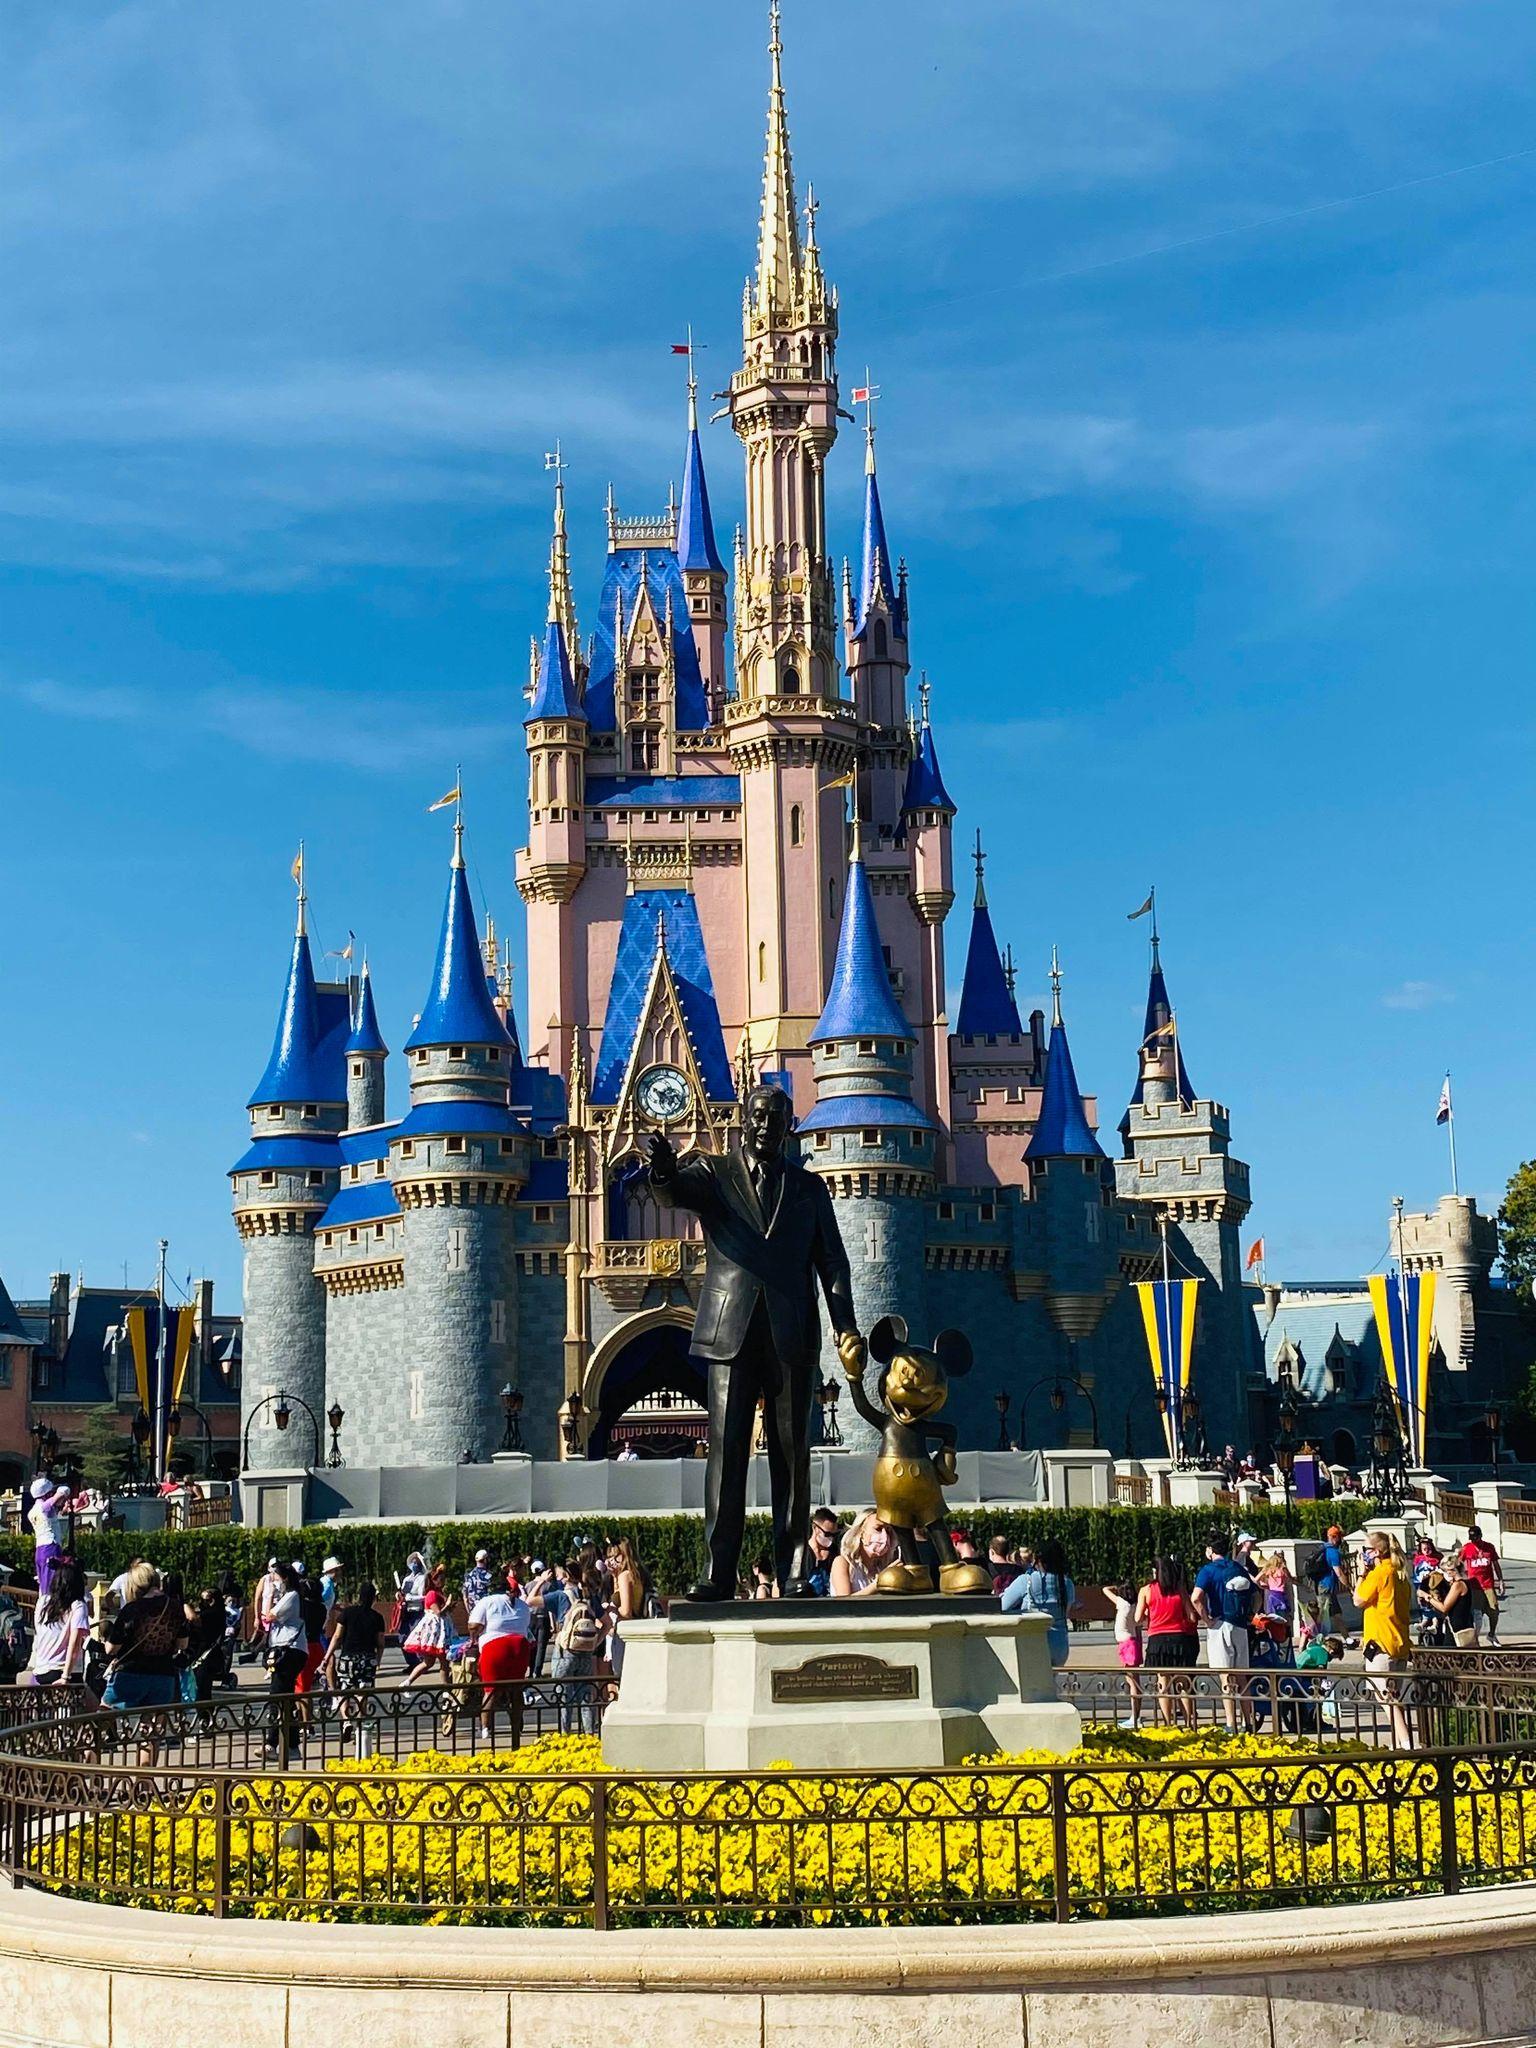 Cinderella Castle painting